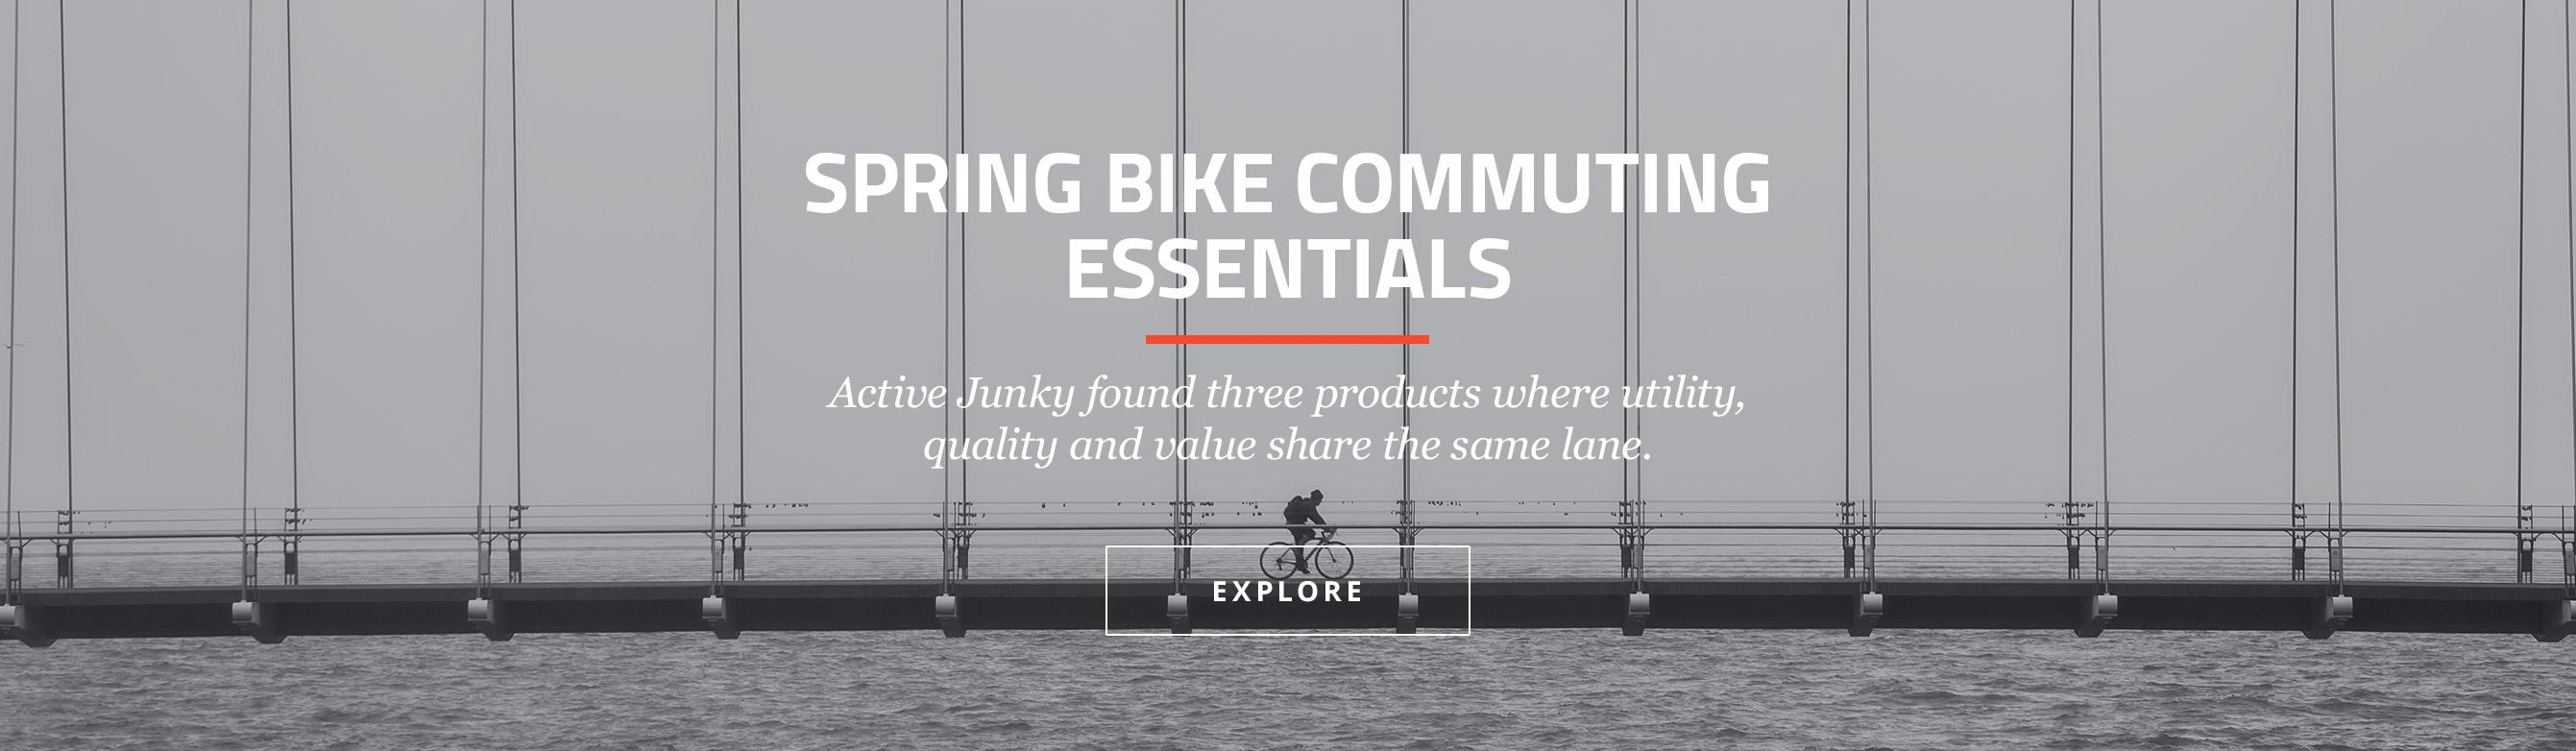 Spring Bike Commuting Essentials